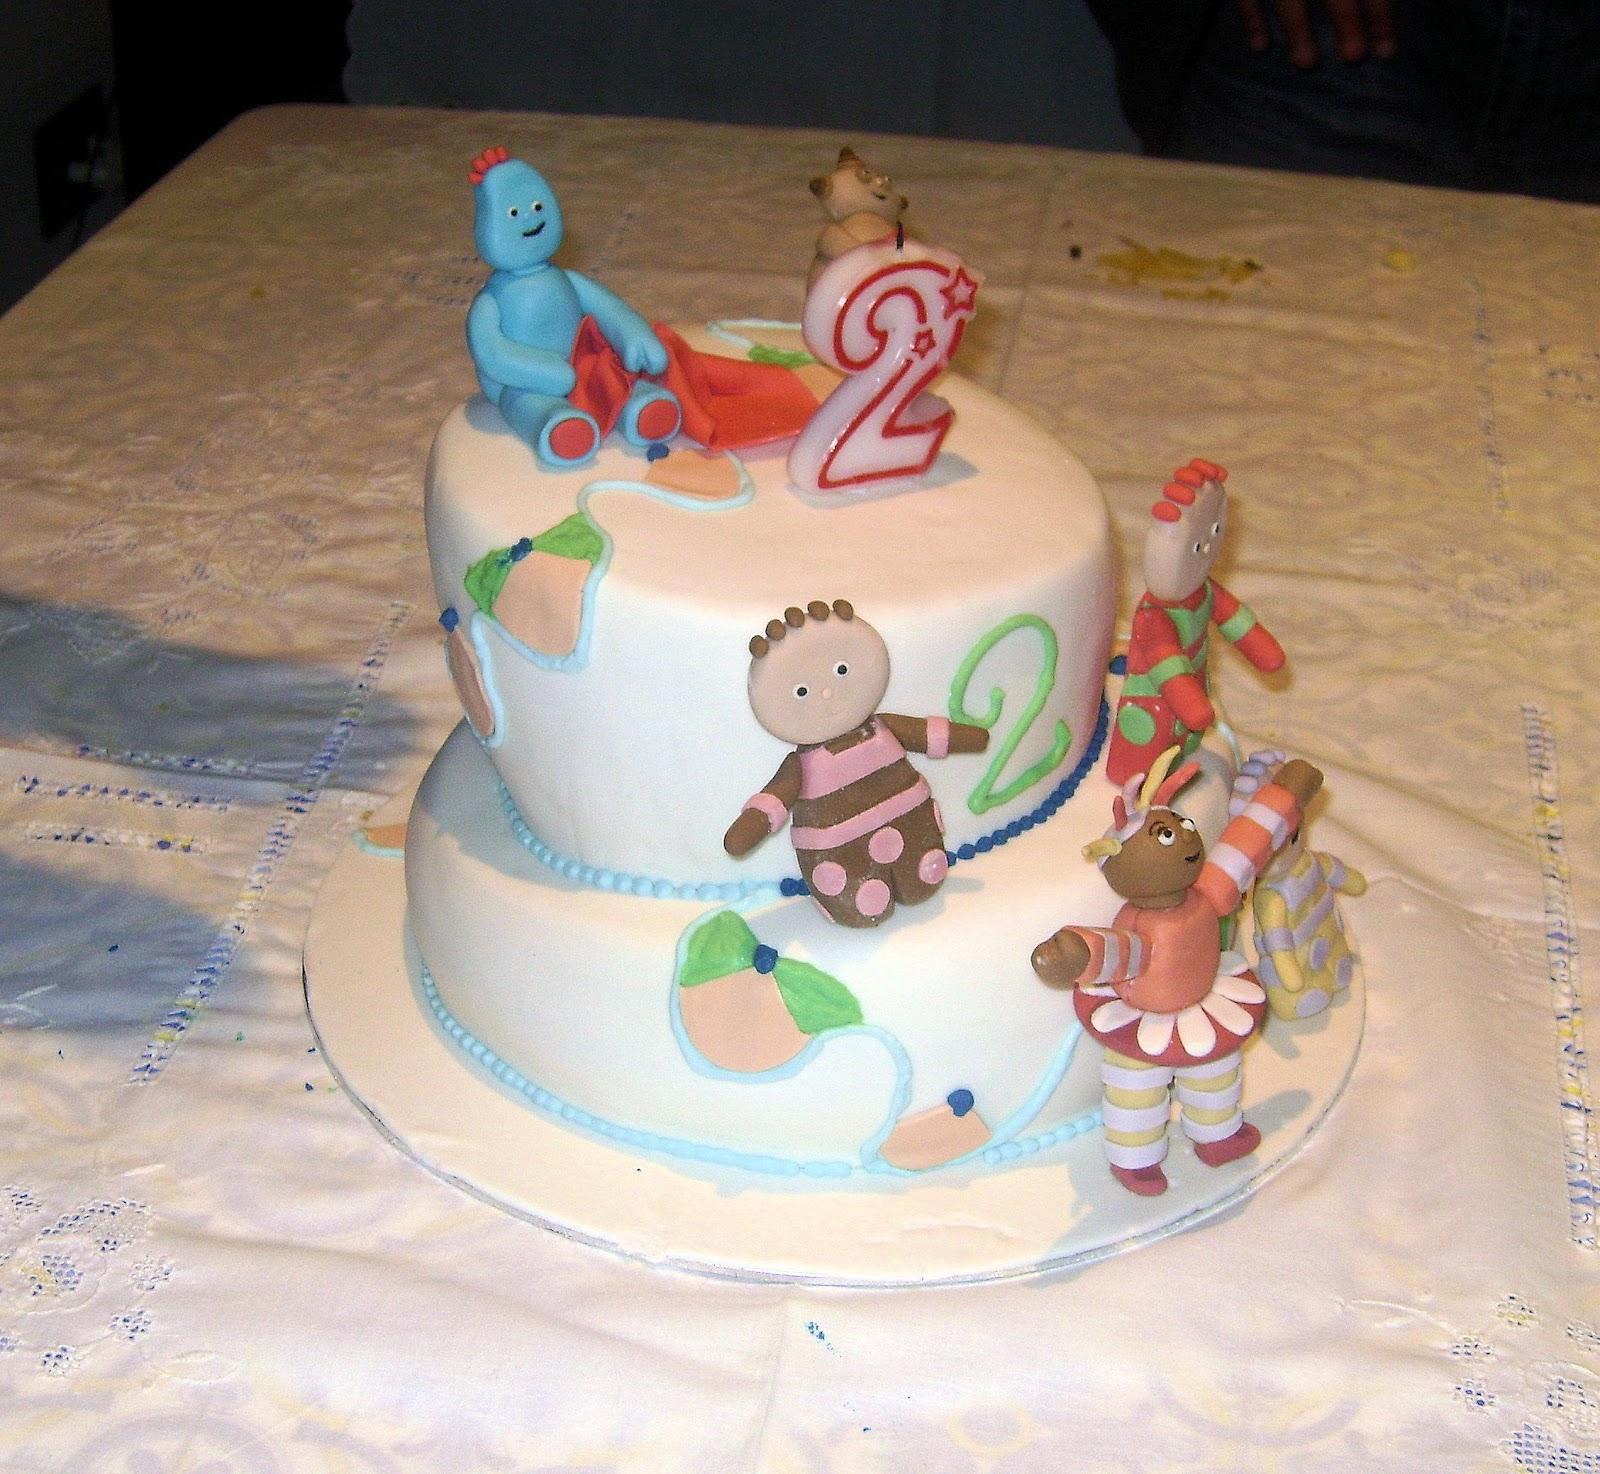 Dolci alchimie ex dolcementemartina wonky cake foresta